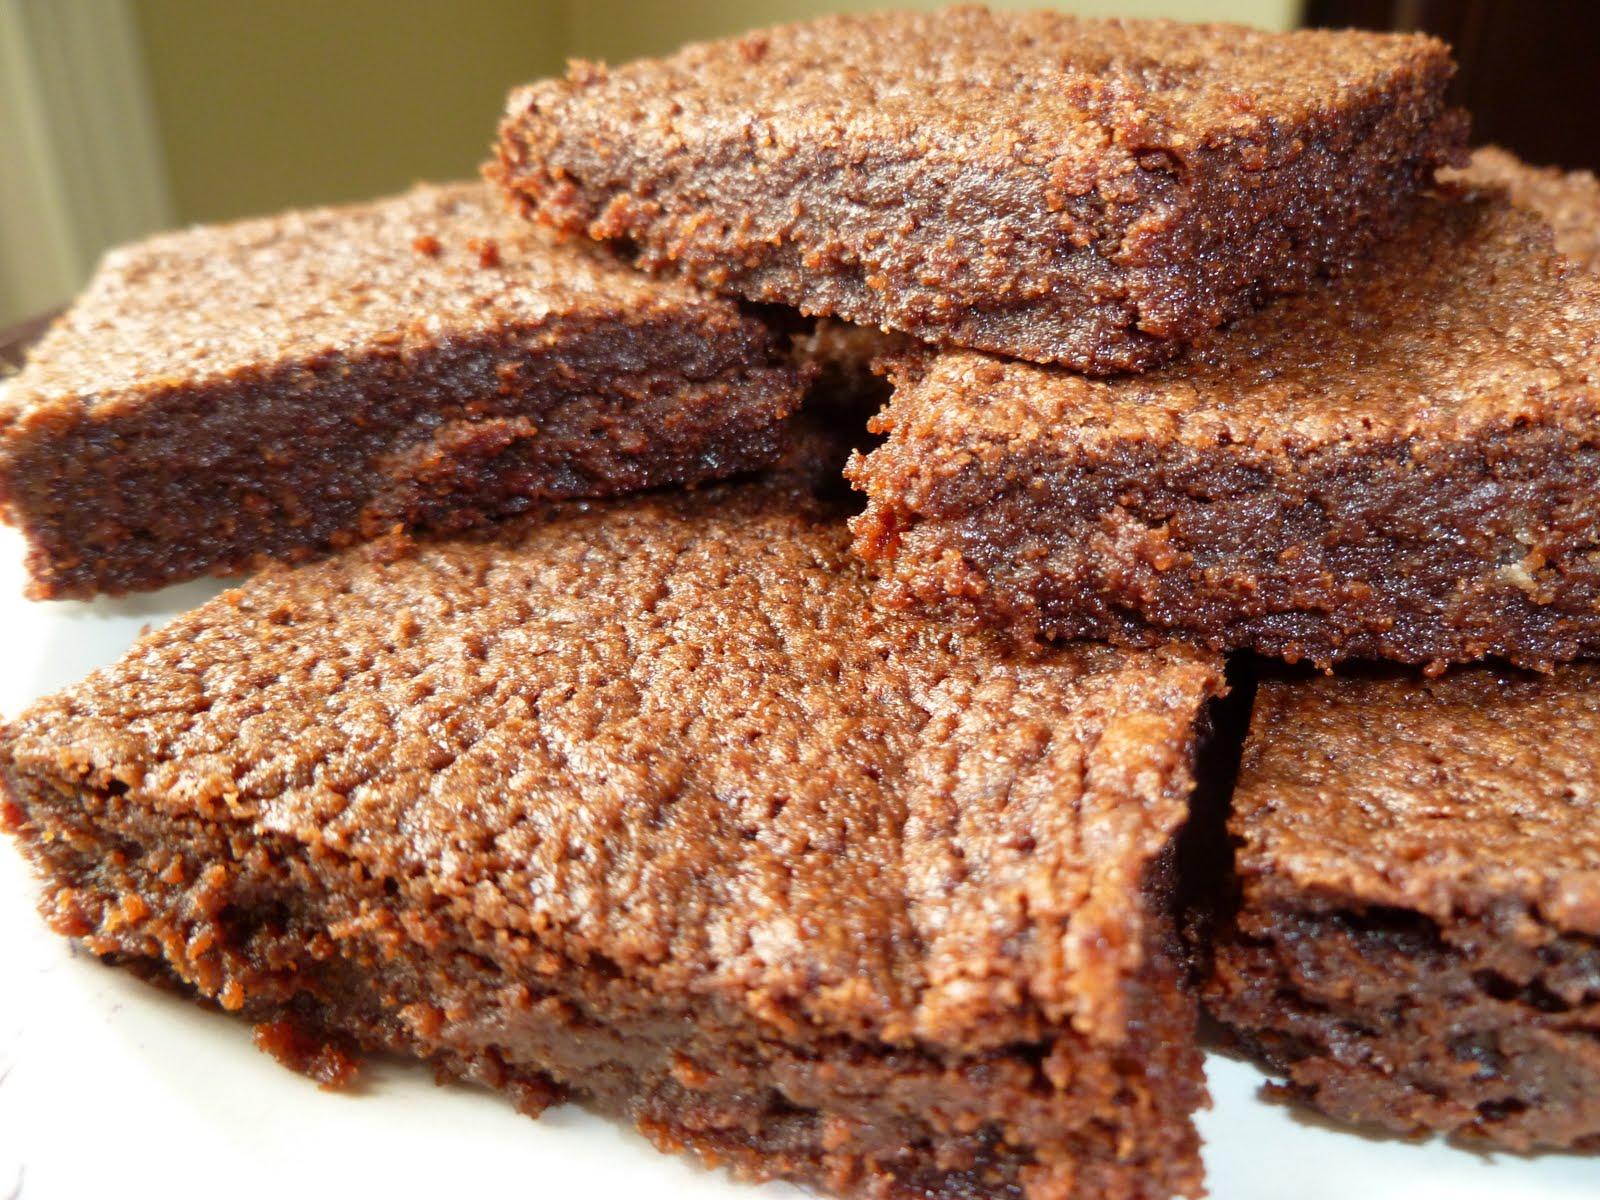 Payard Chocolate Cake Chocolate Cake Made May